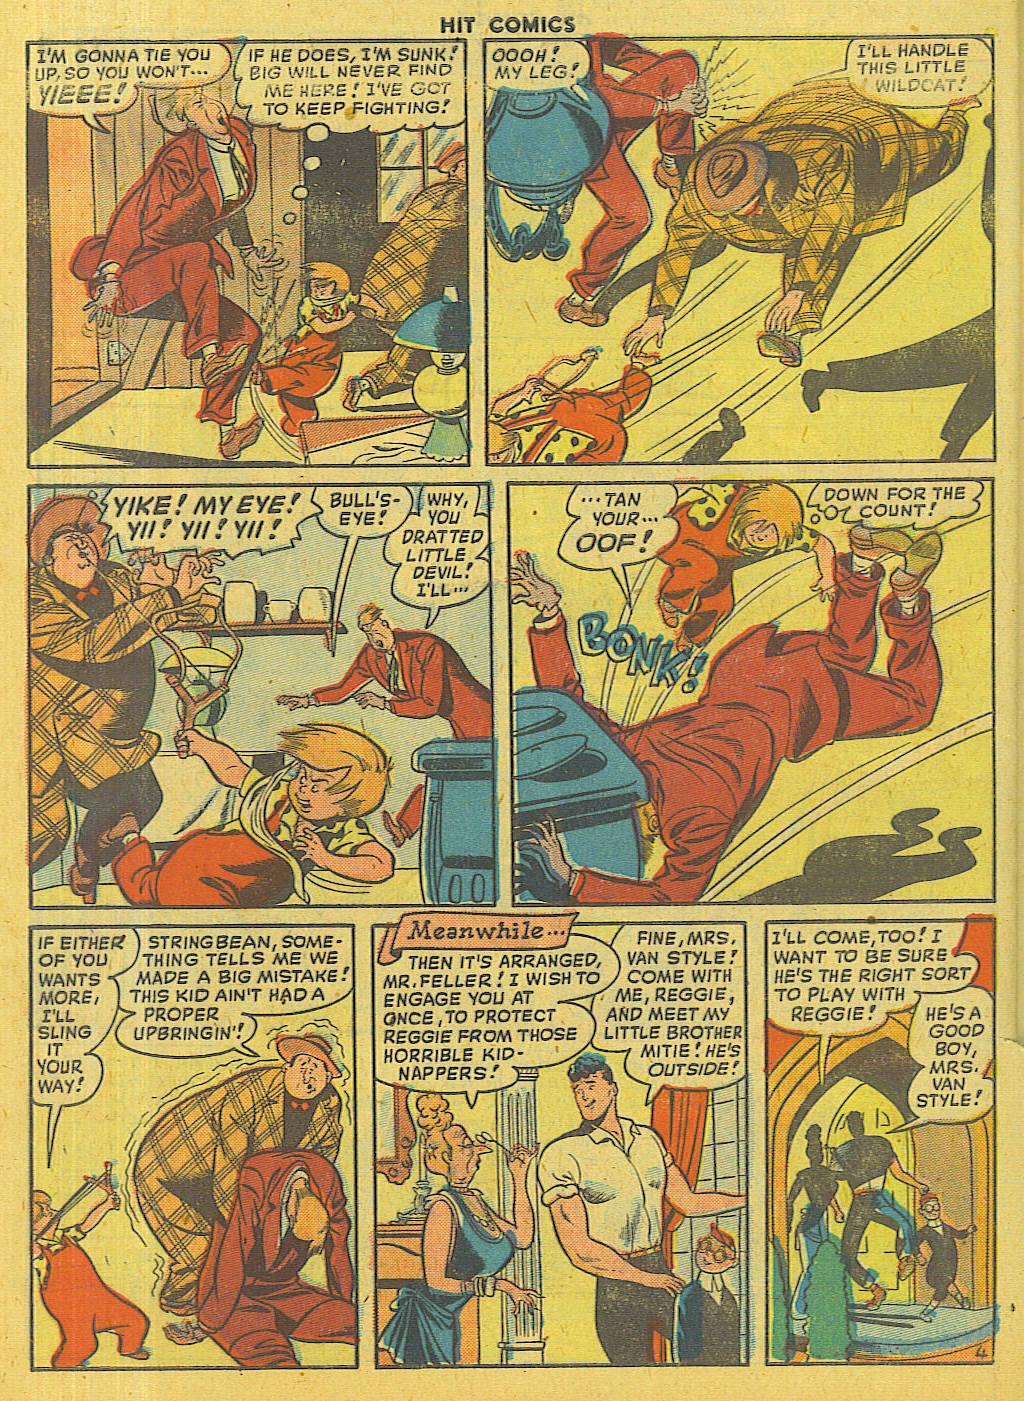 Read online Hit Comics comic -  Issue #56 - 46